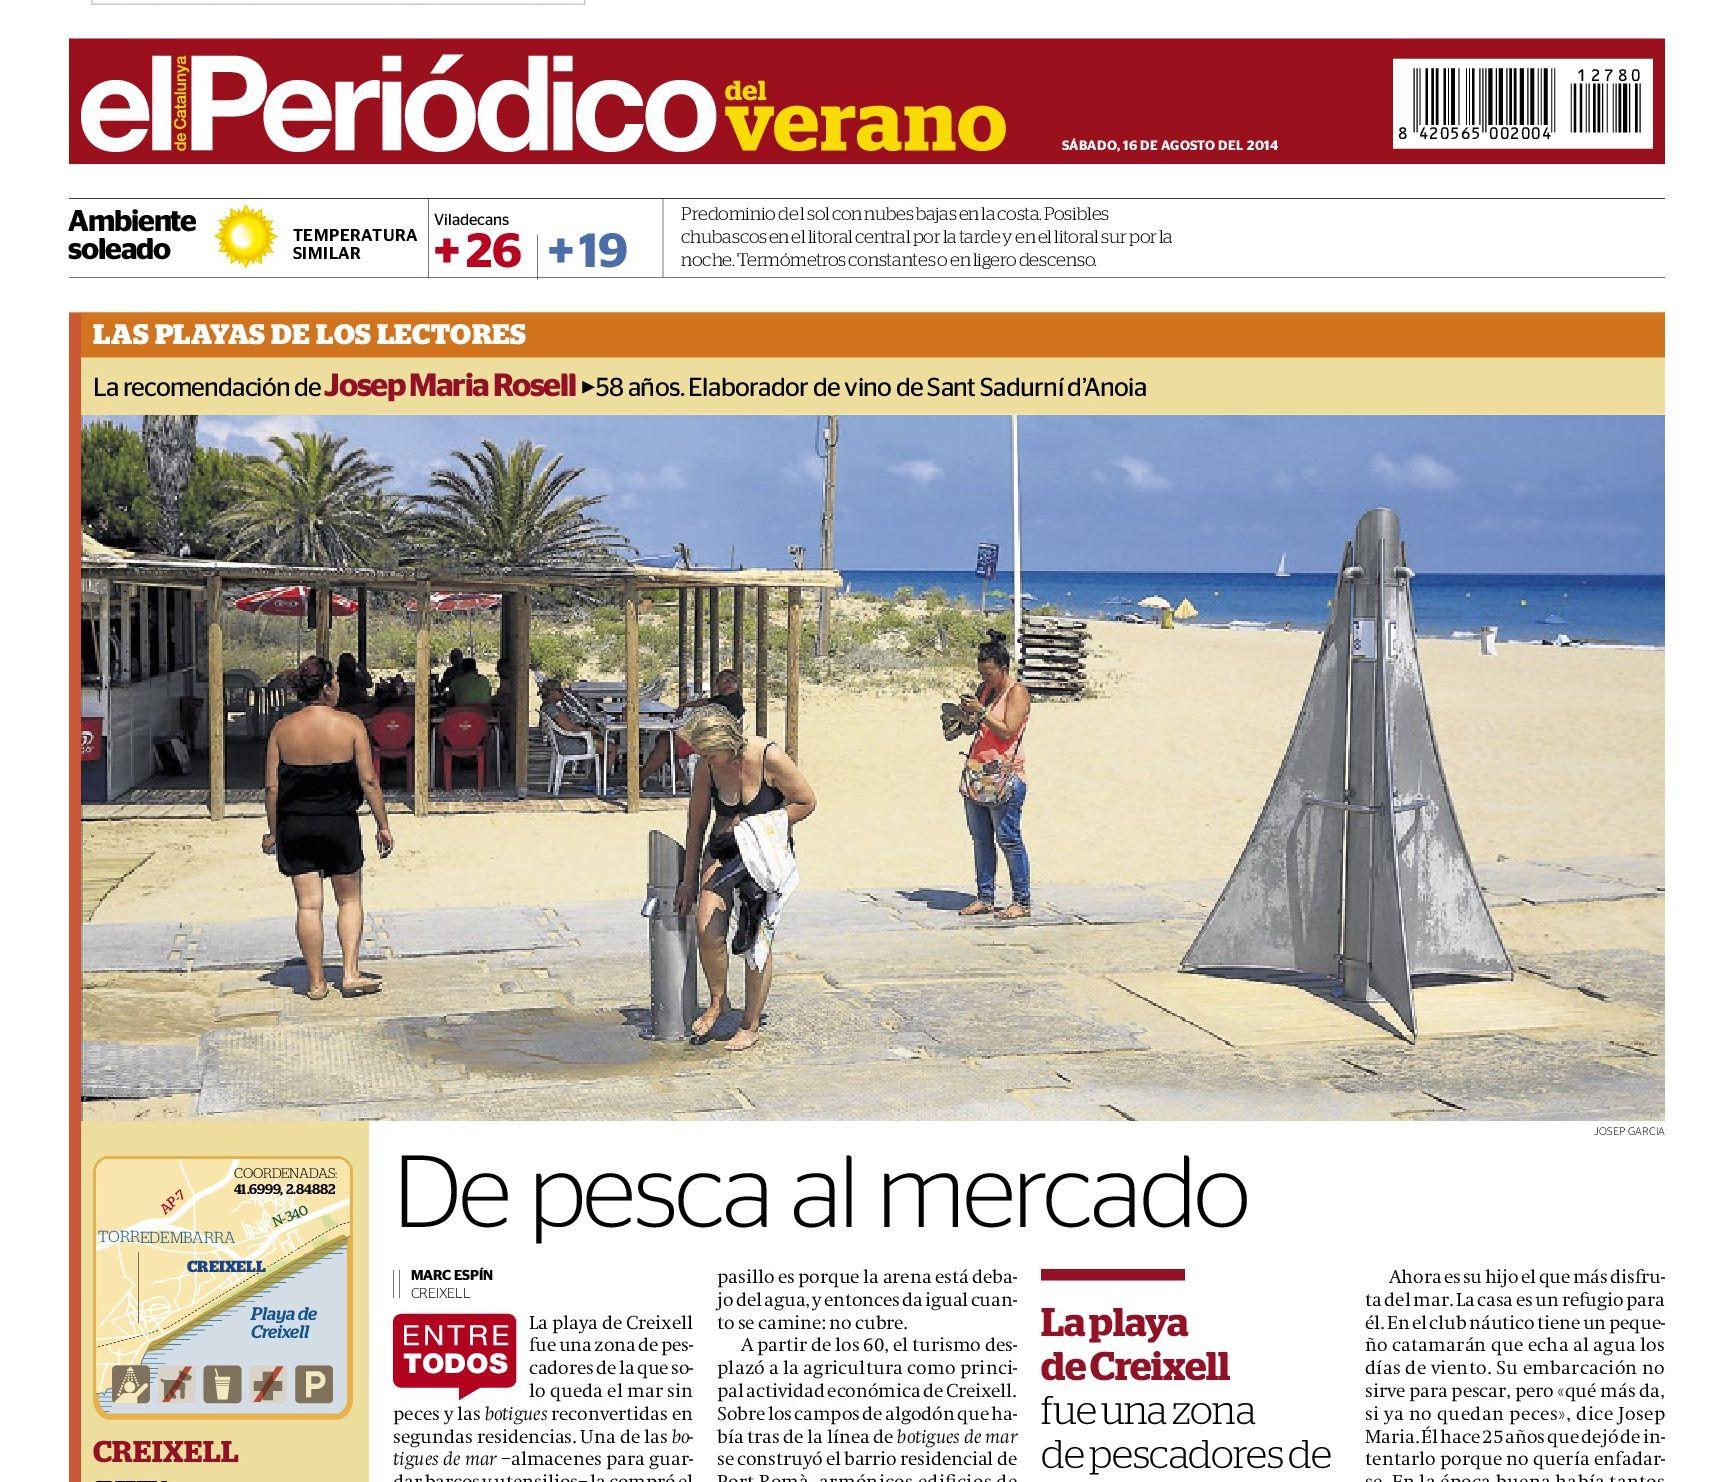 Playa de Creixell | De pesca al mercado